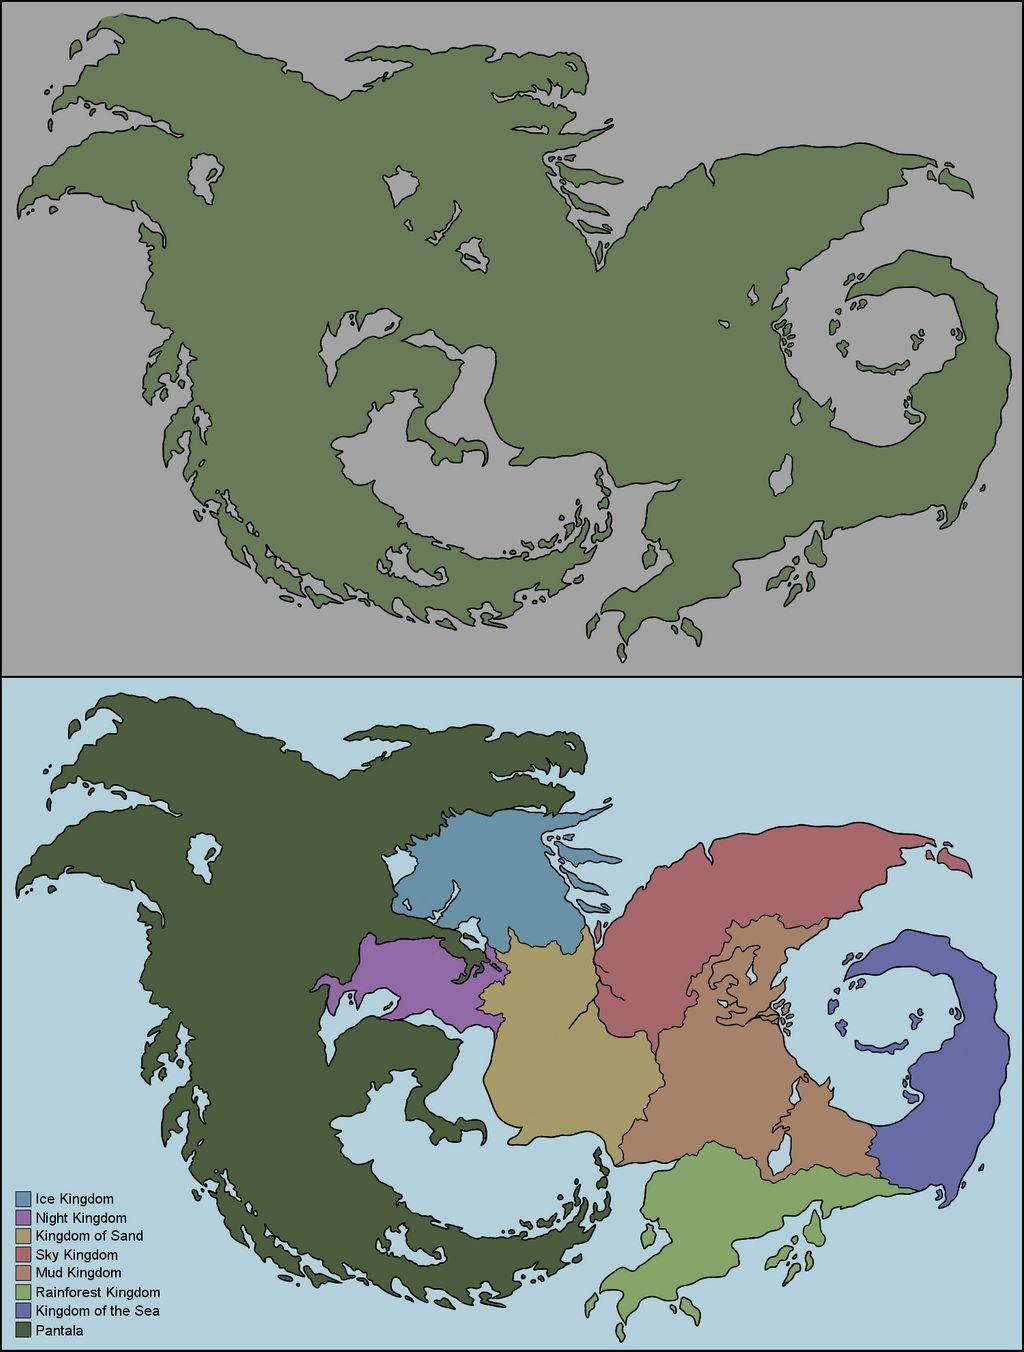 Wings Of Fire Map Of Pyrrhia : wings, pyrrhia, Supercontinent, Dimepaw, DeviantArt, Wings, Fire,, Dragons,